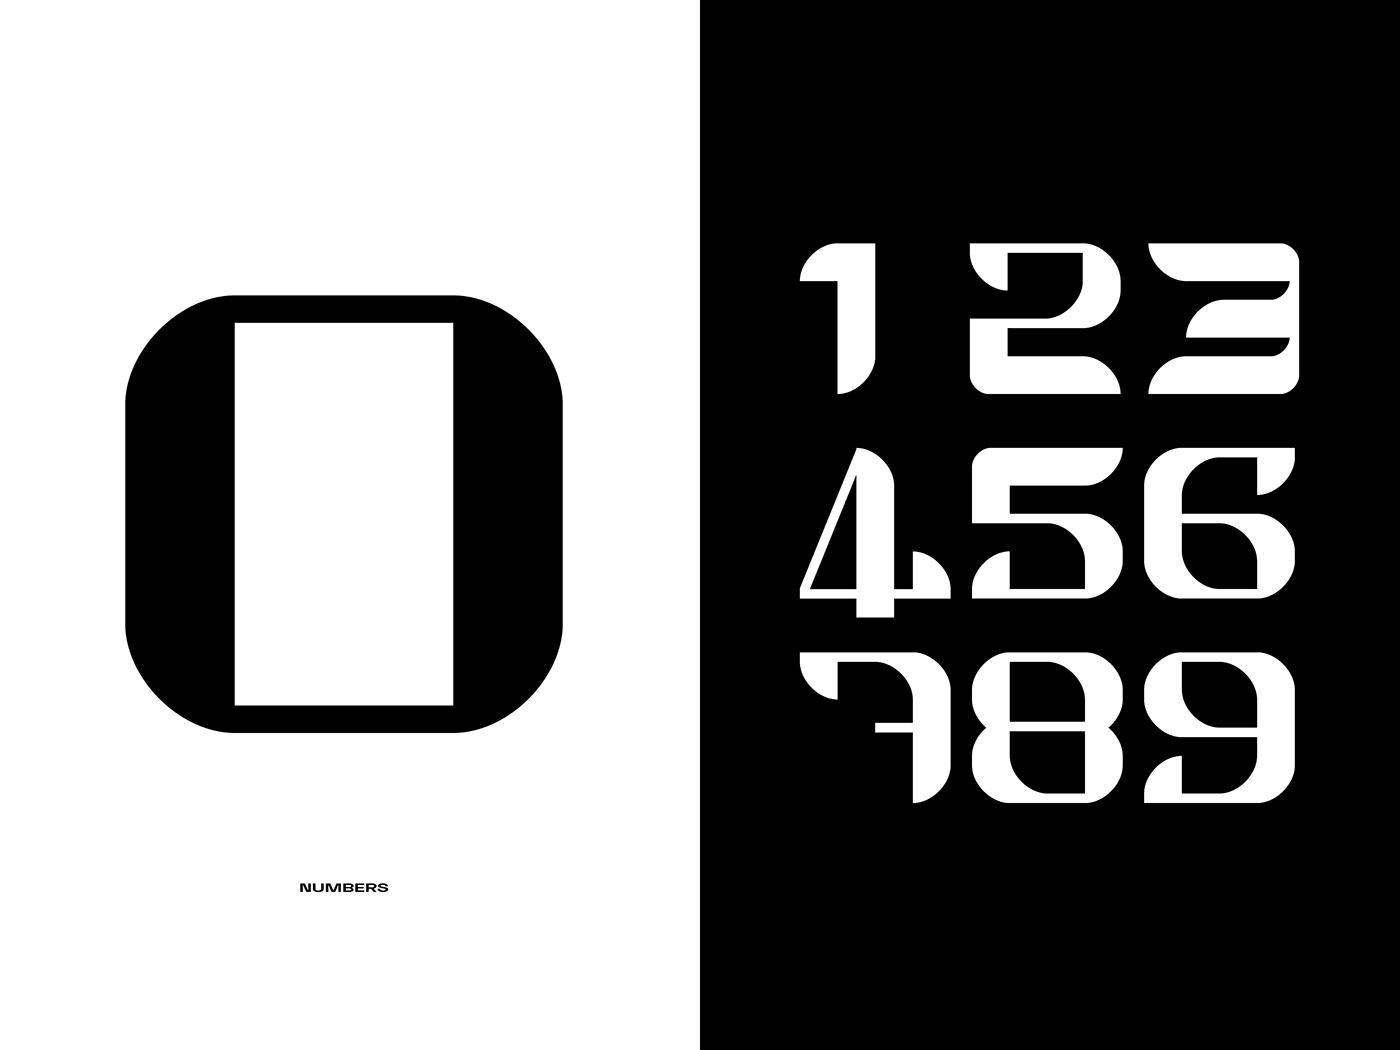 font,Fontself,type,Typeface,fonts,typography  ,graphic design ,flowa,type design,glyphs